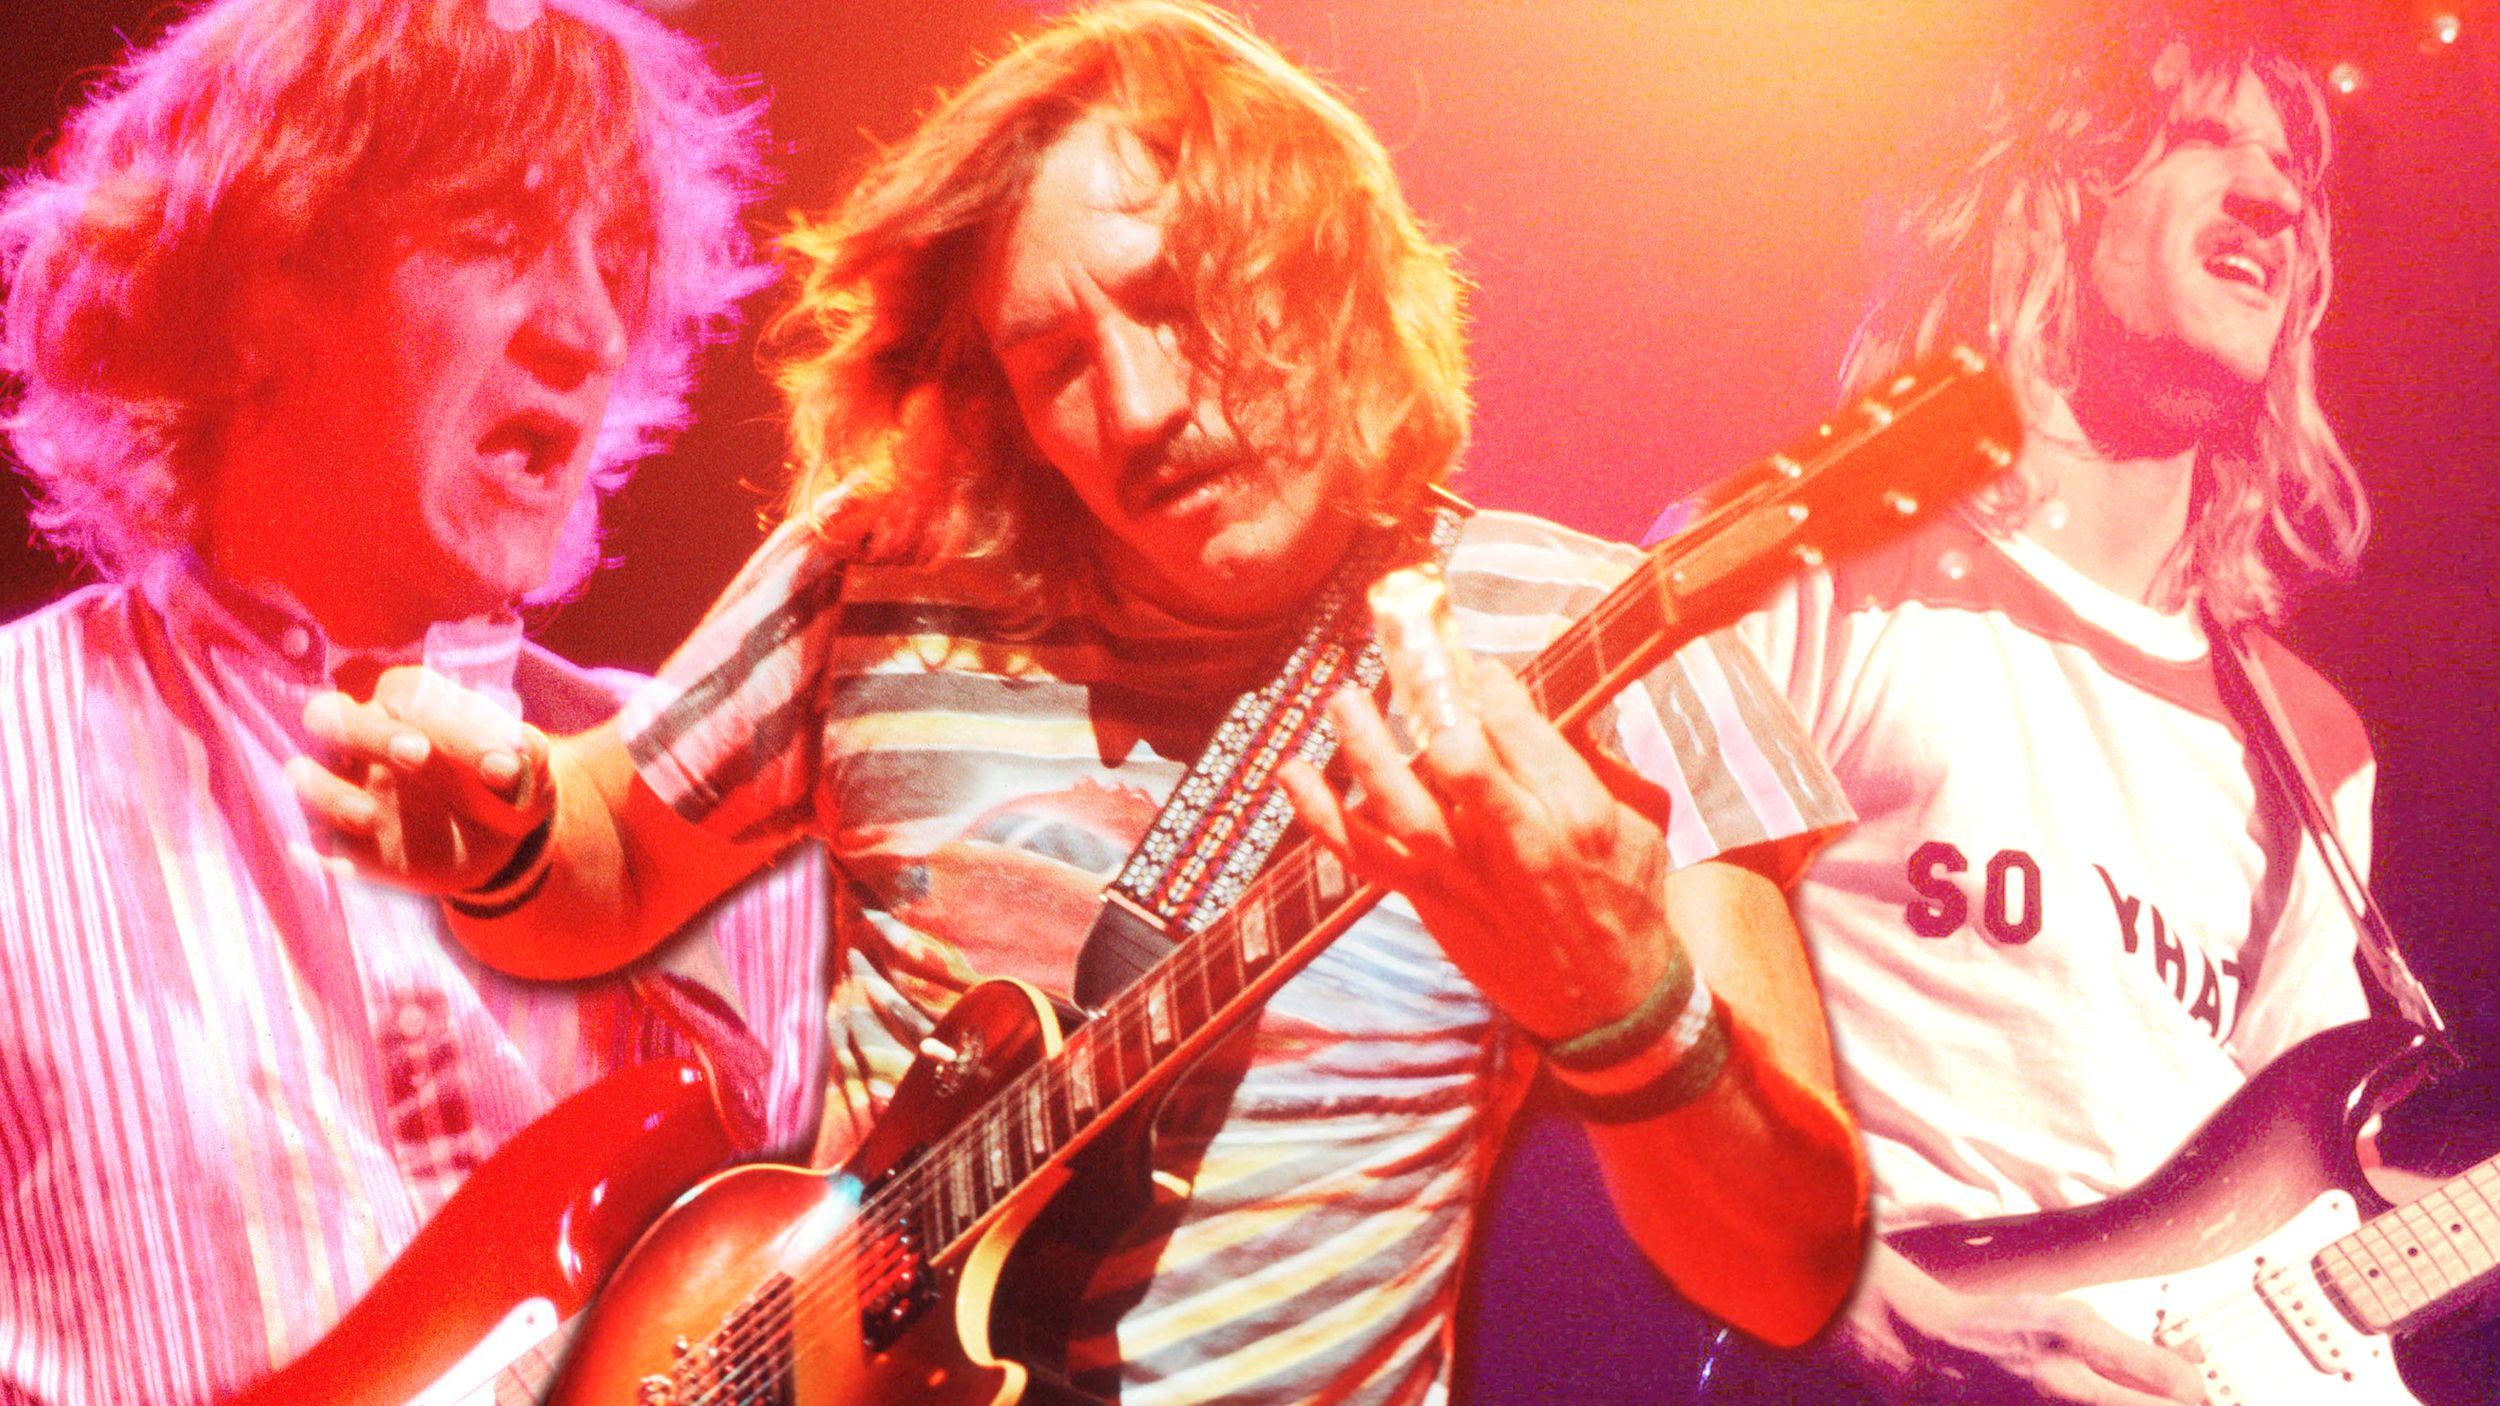 Joe Walsh Hosts Concert for Veterans - Eagles Guitarist on Veterans